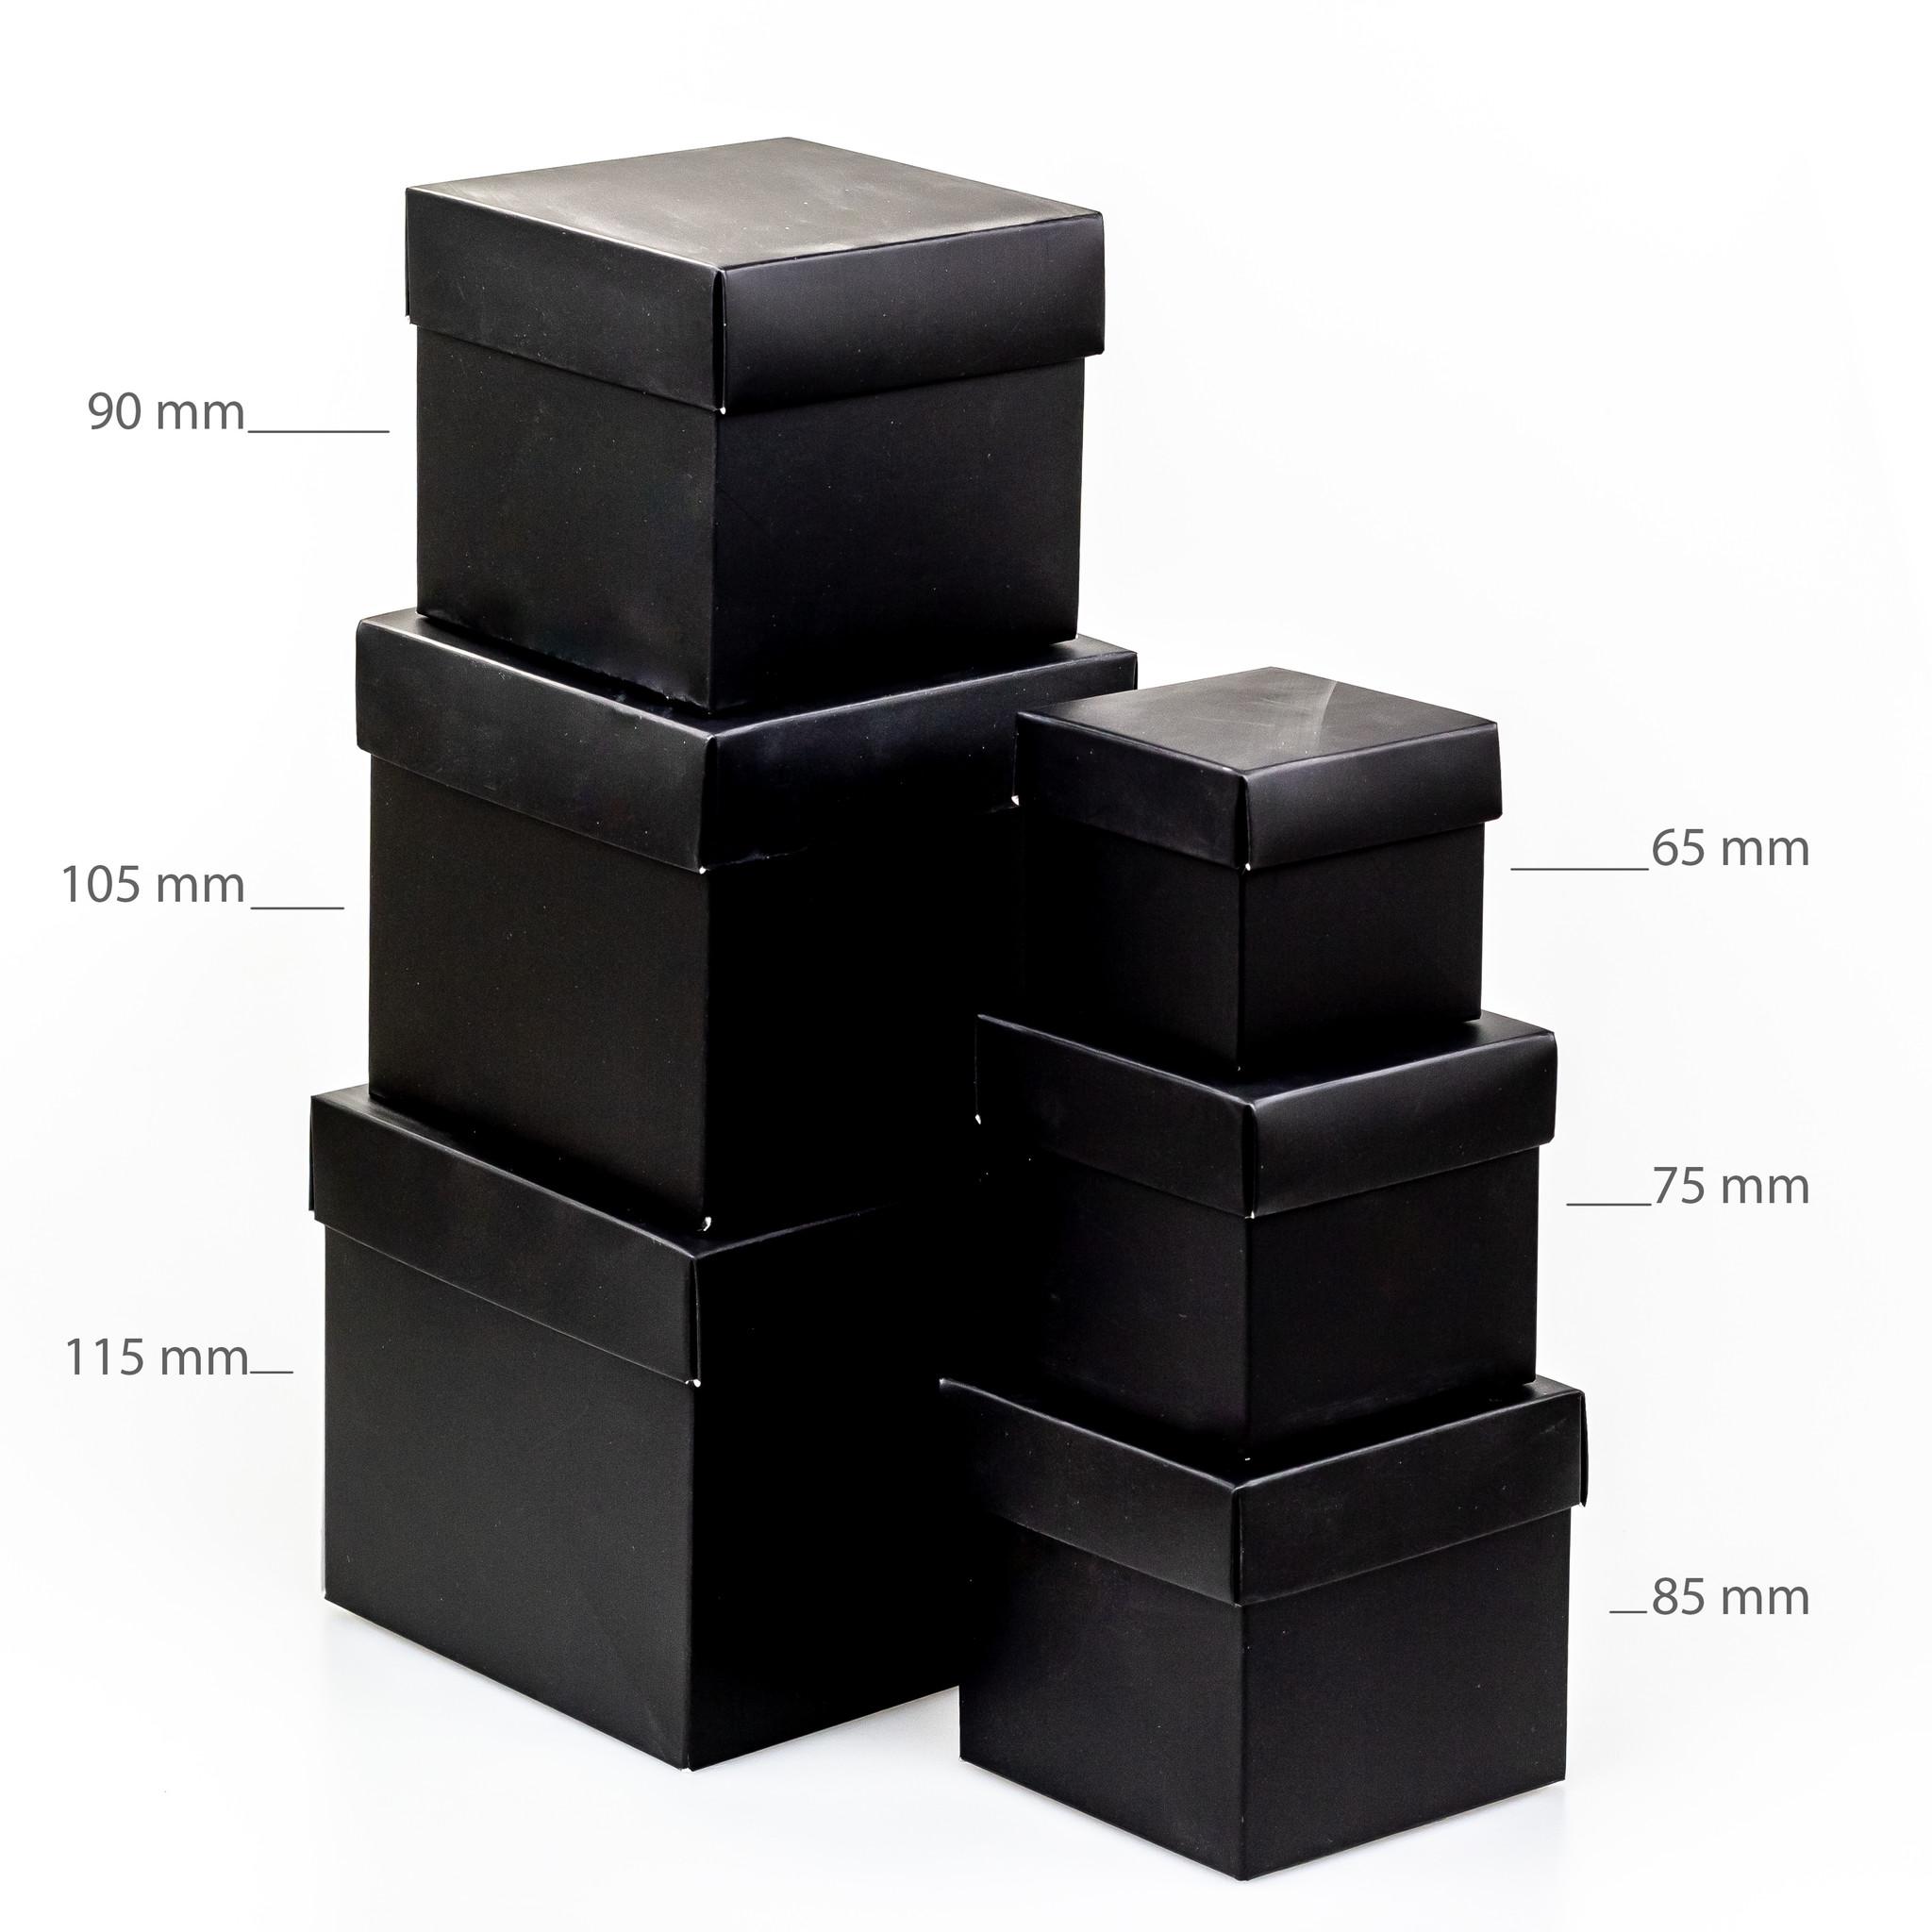 Cubebox - Vert Clair